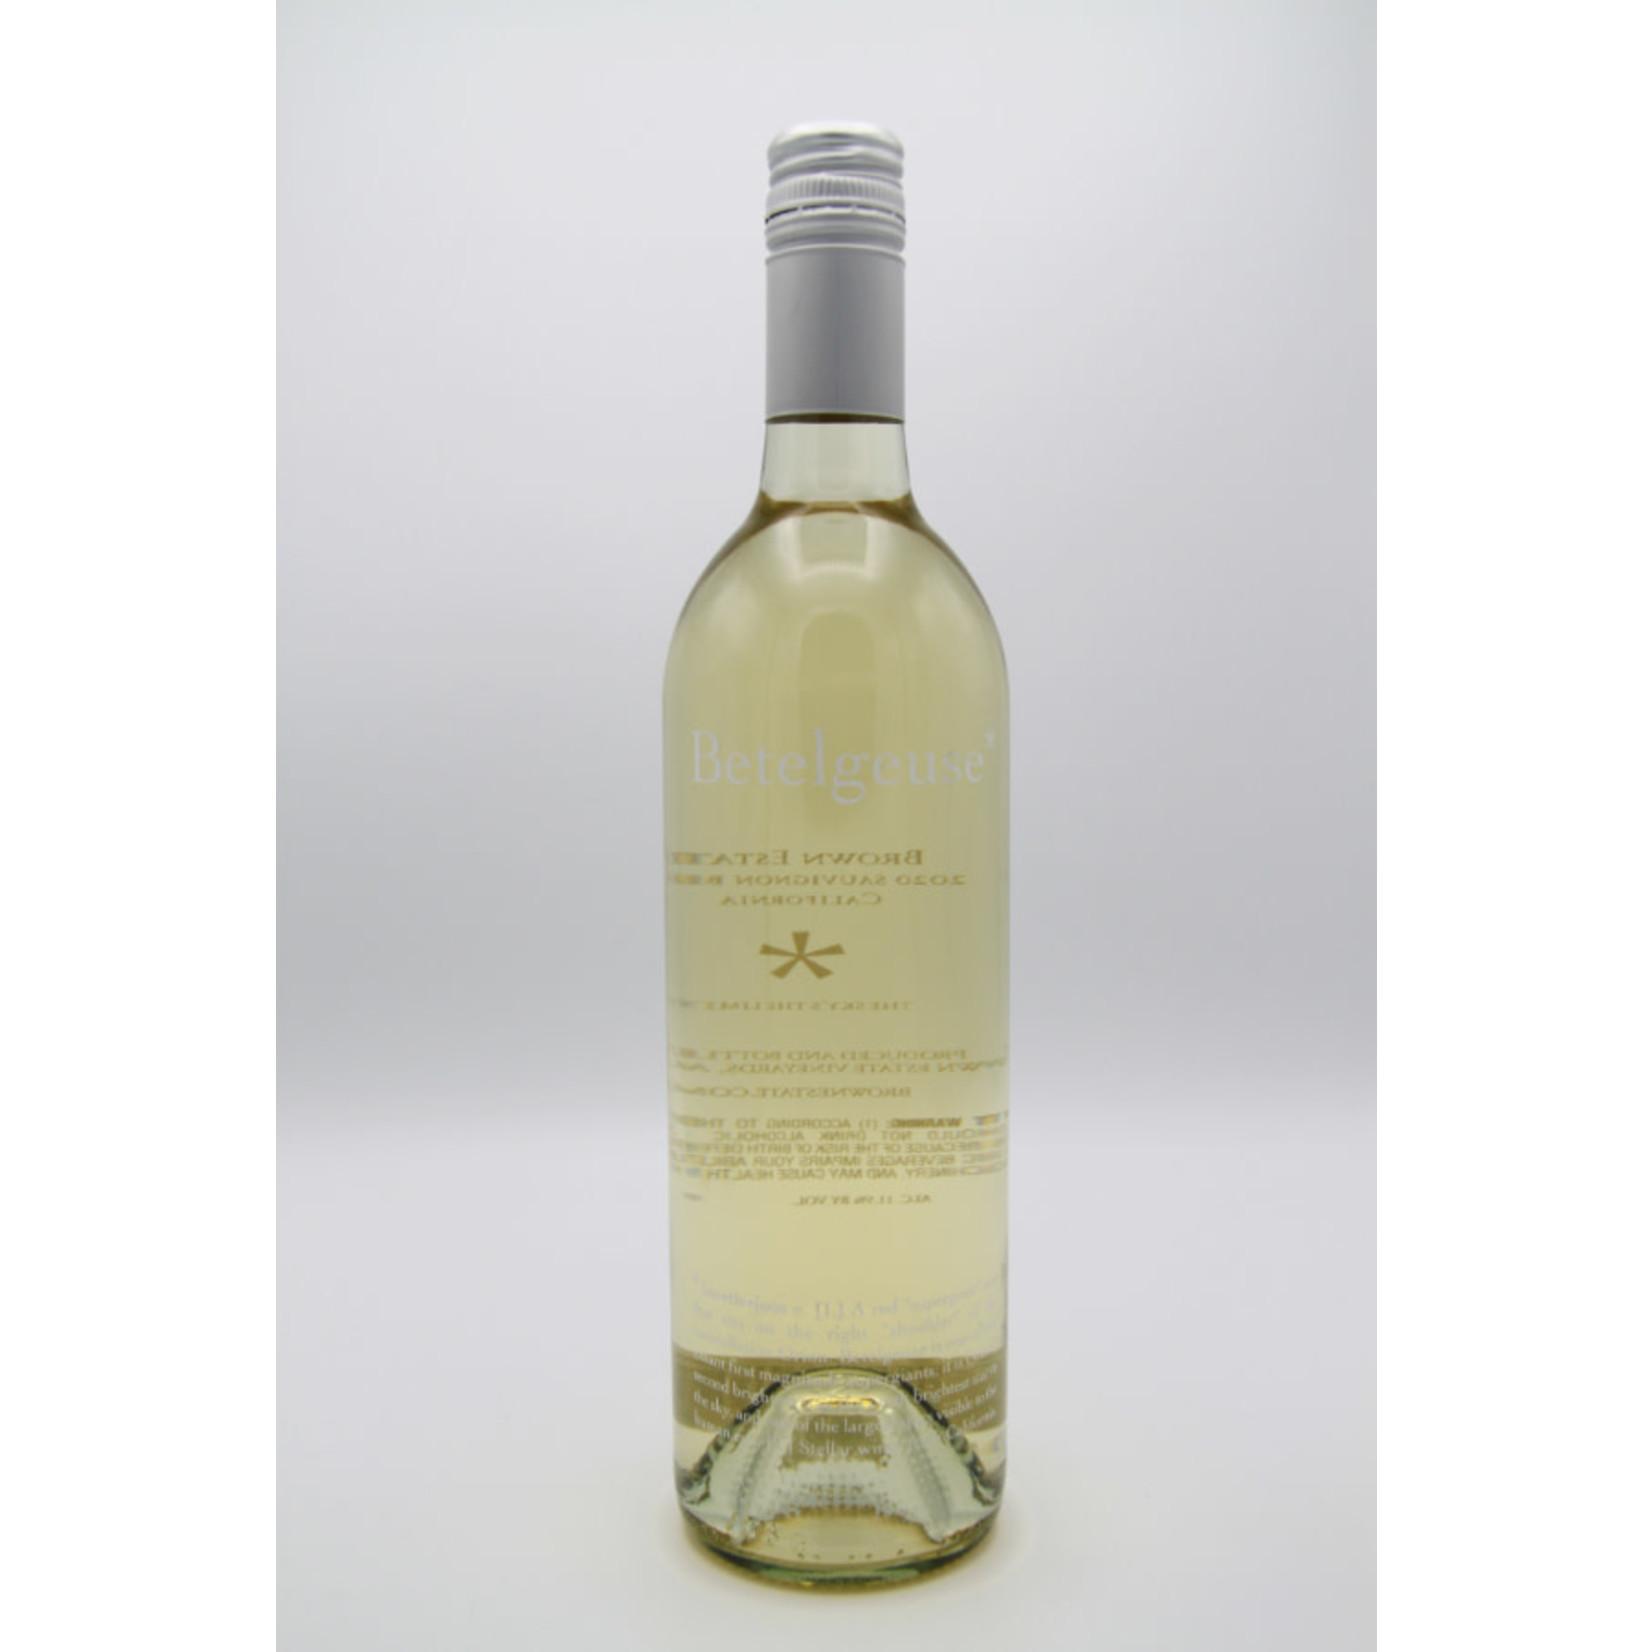 2020 Brown Estate 'Betelgeuse' Sauvignon Blanc